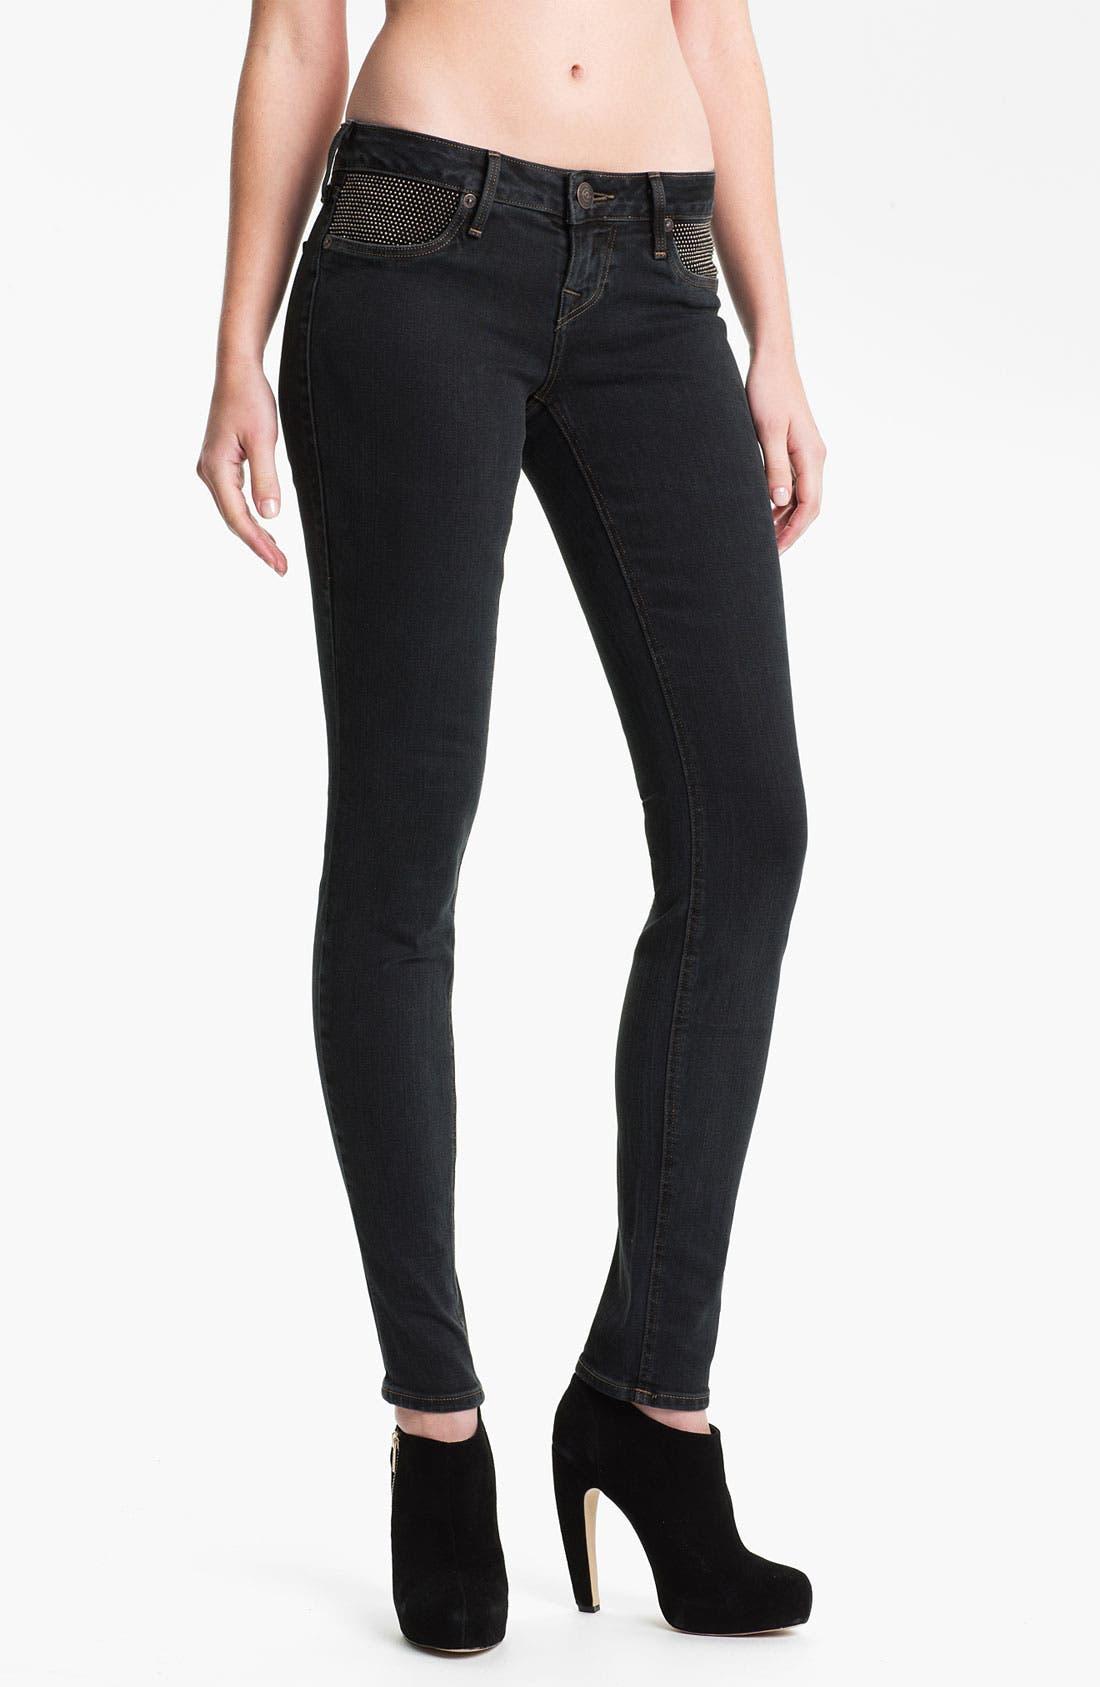 Main Image - True Religion Brand Jeans 'Shannon' Studded Pocket Skinny Jeans (Black Stone)